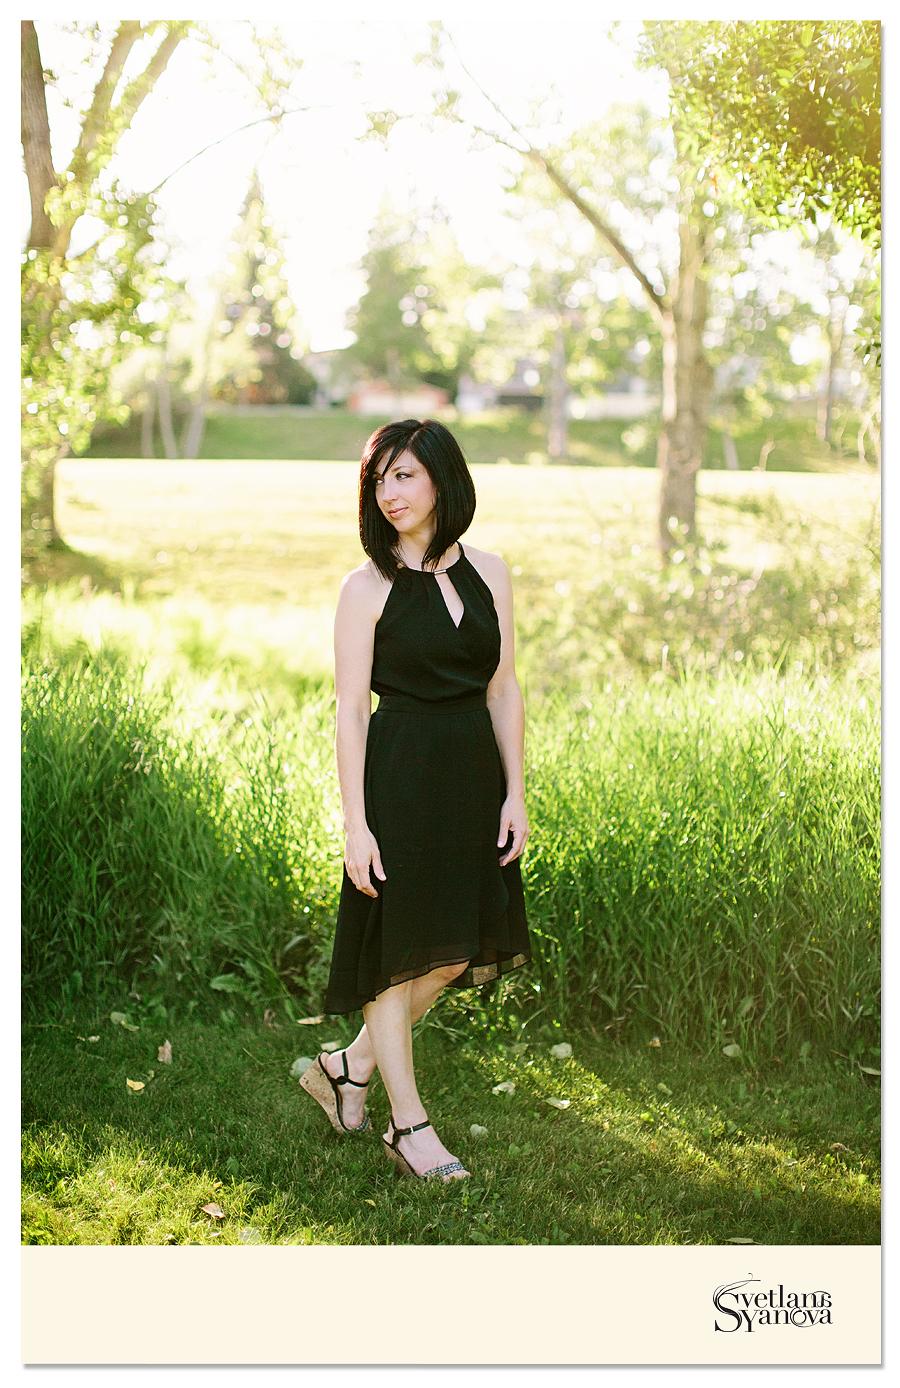 Relaxed And Beautiful Portraits Business Headshot In Calgary Svetlana Yanova Calgary